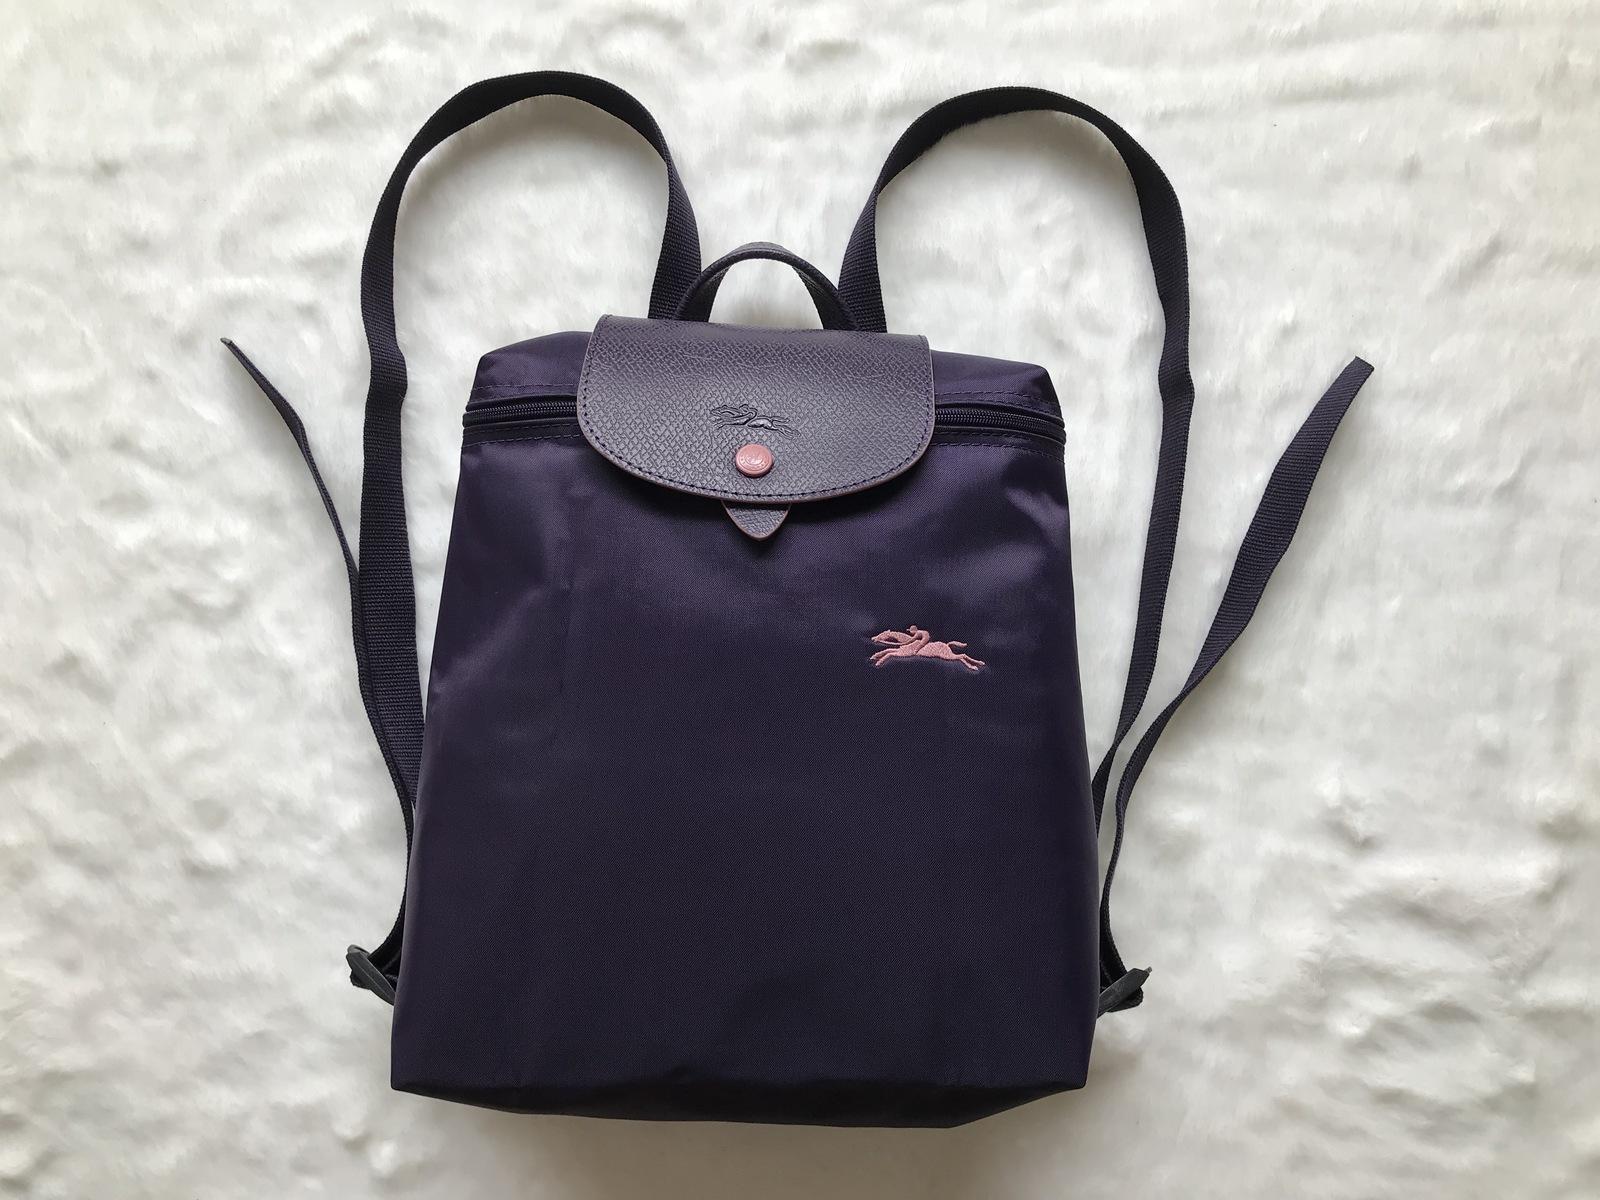 70ade813e301 France Md Longchamp Le Pliage Club and 50 similar items